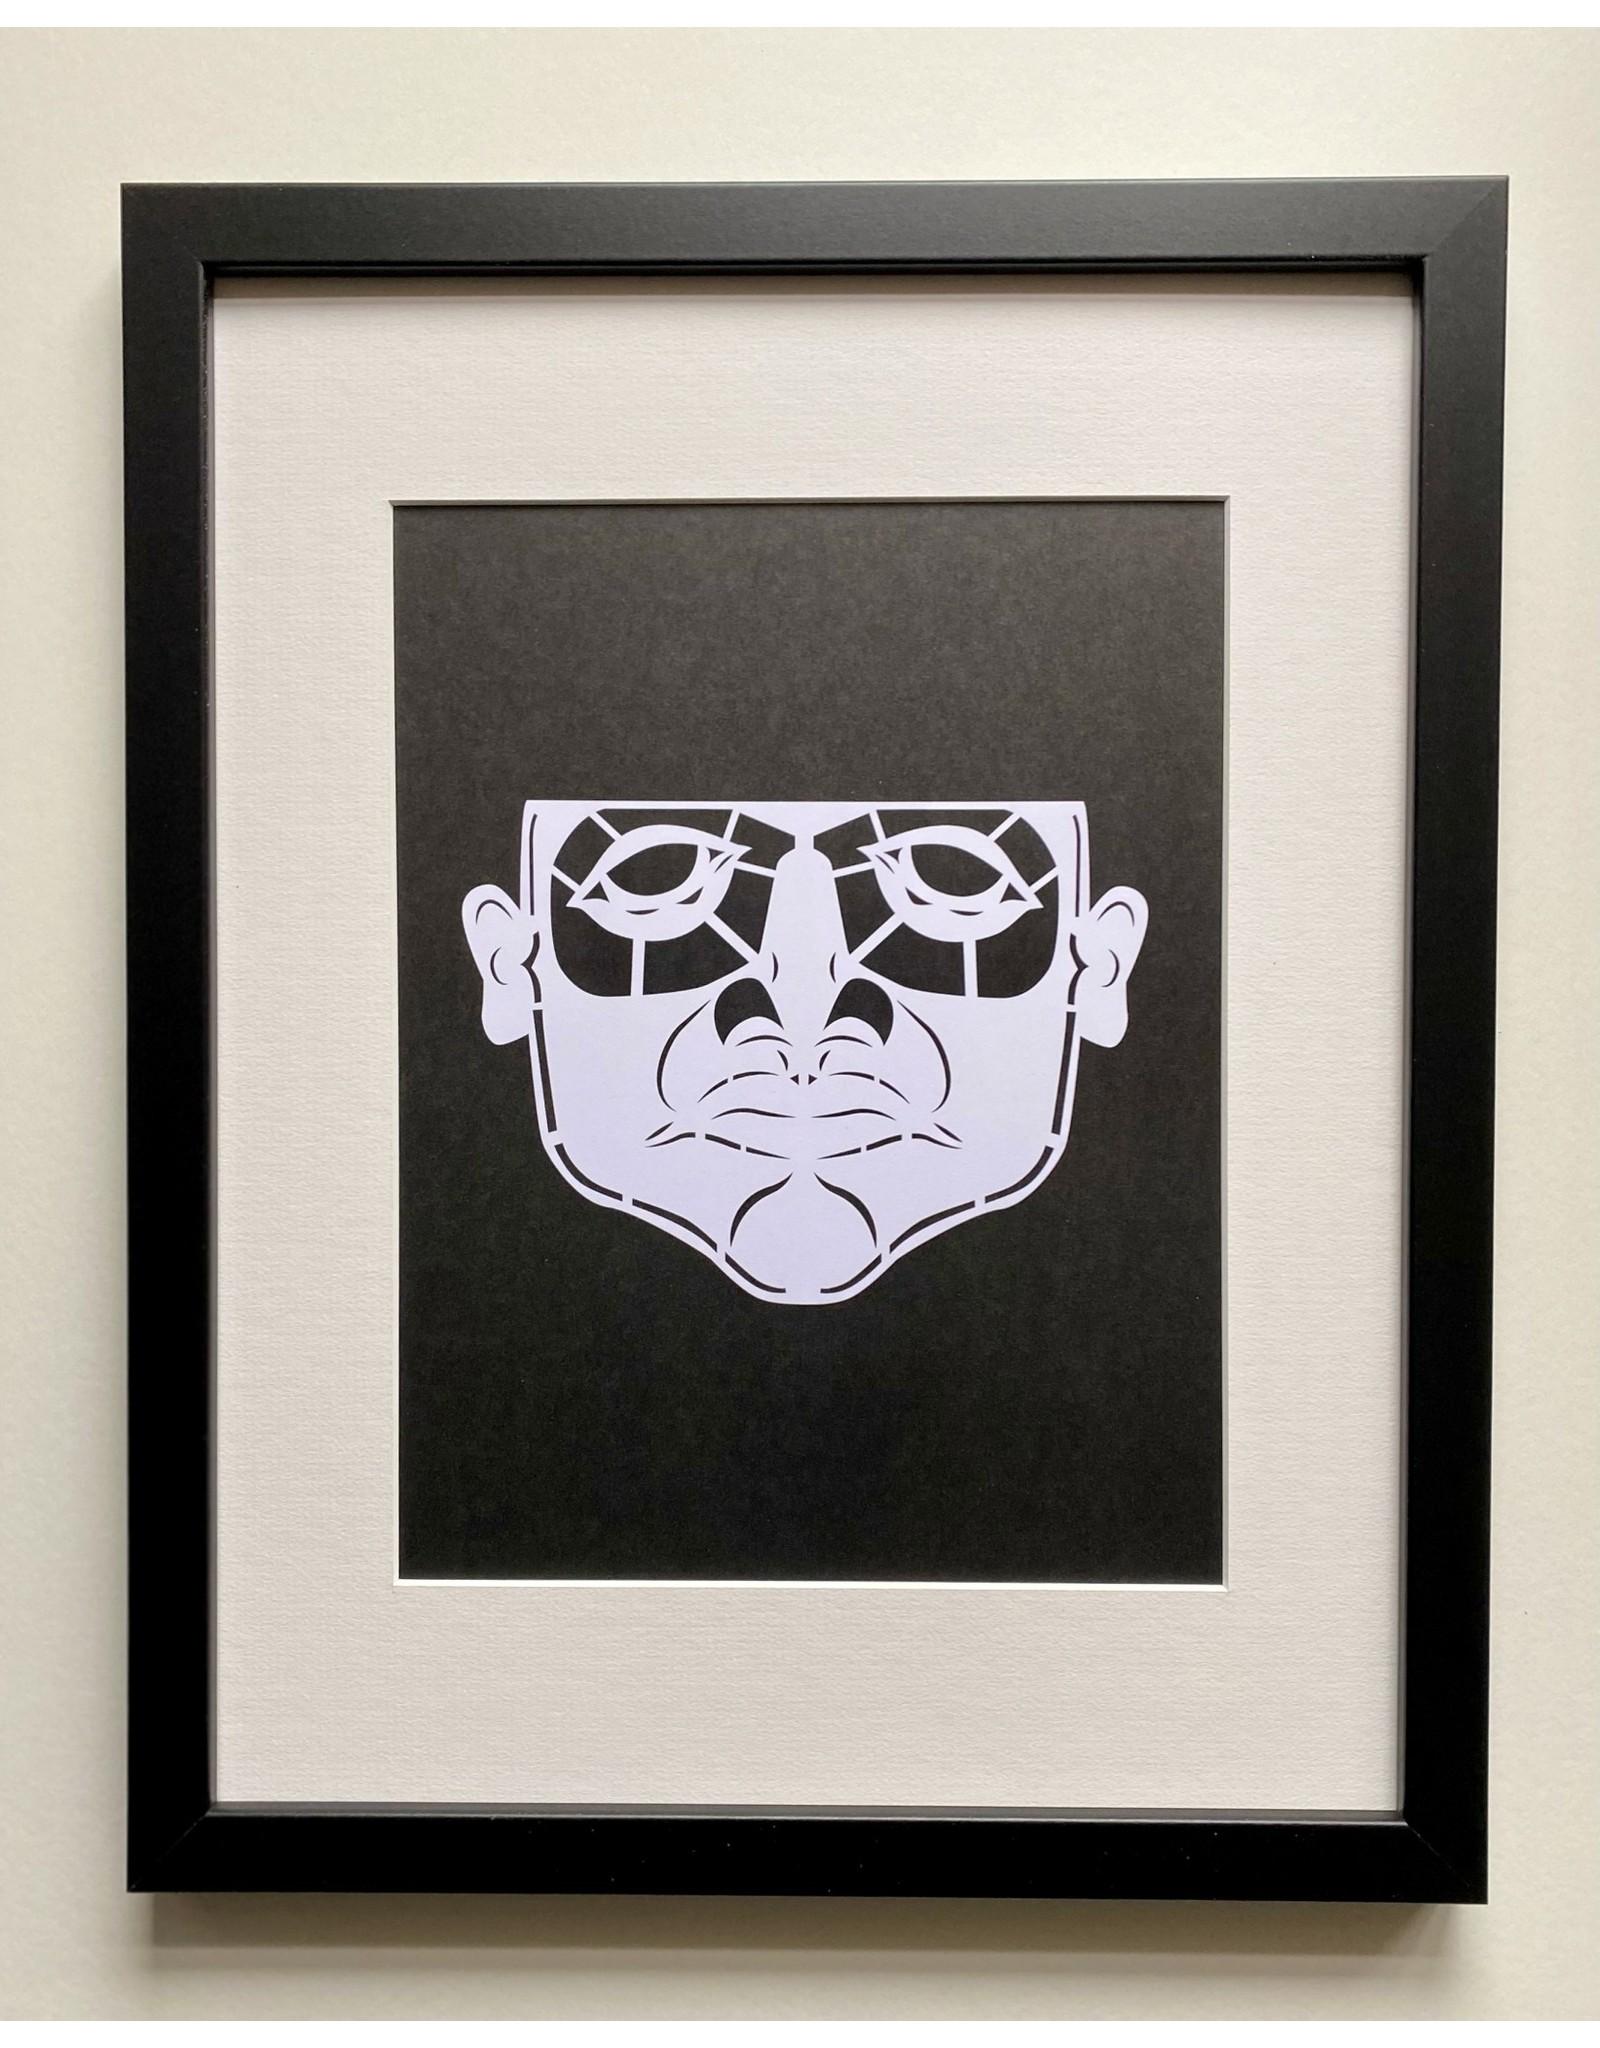 Archie Cavanaugh Face | Archie Cavanaugh, Jr.